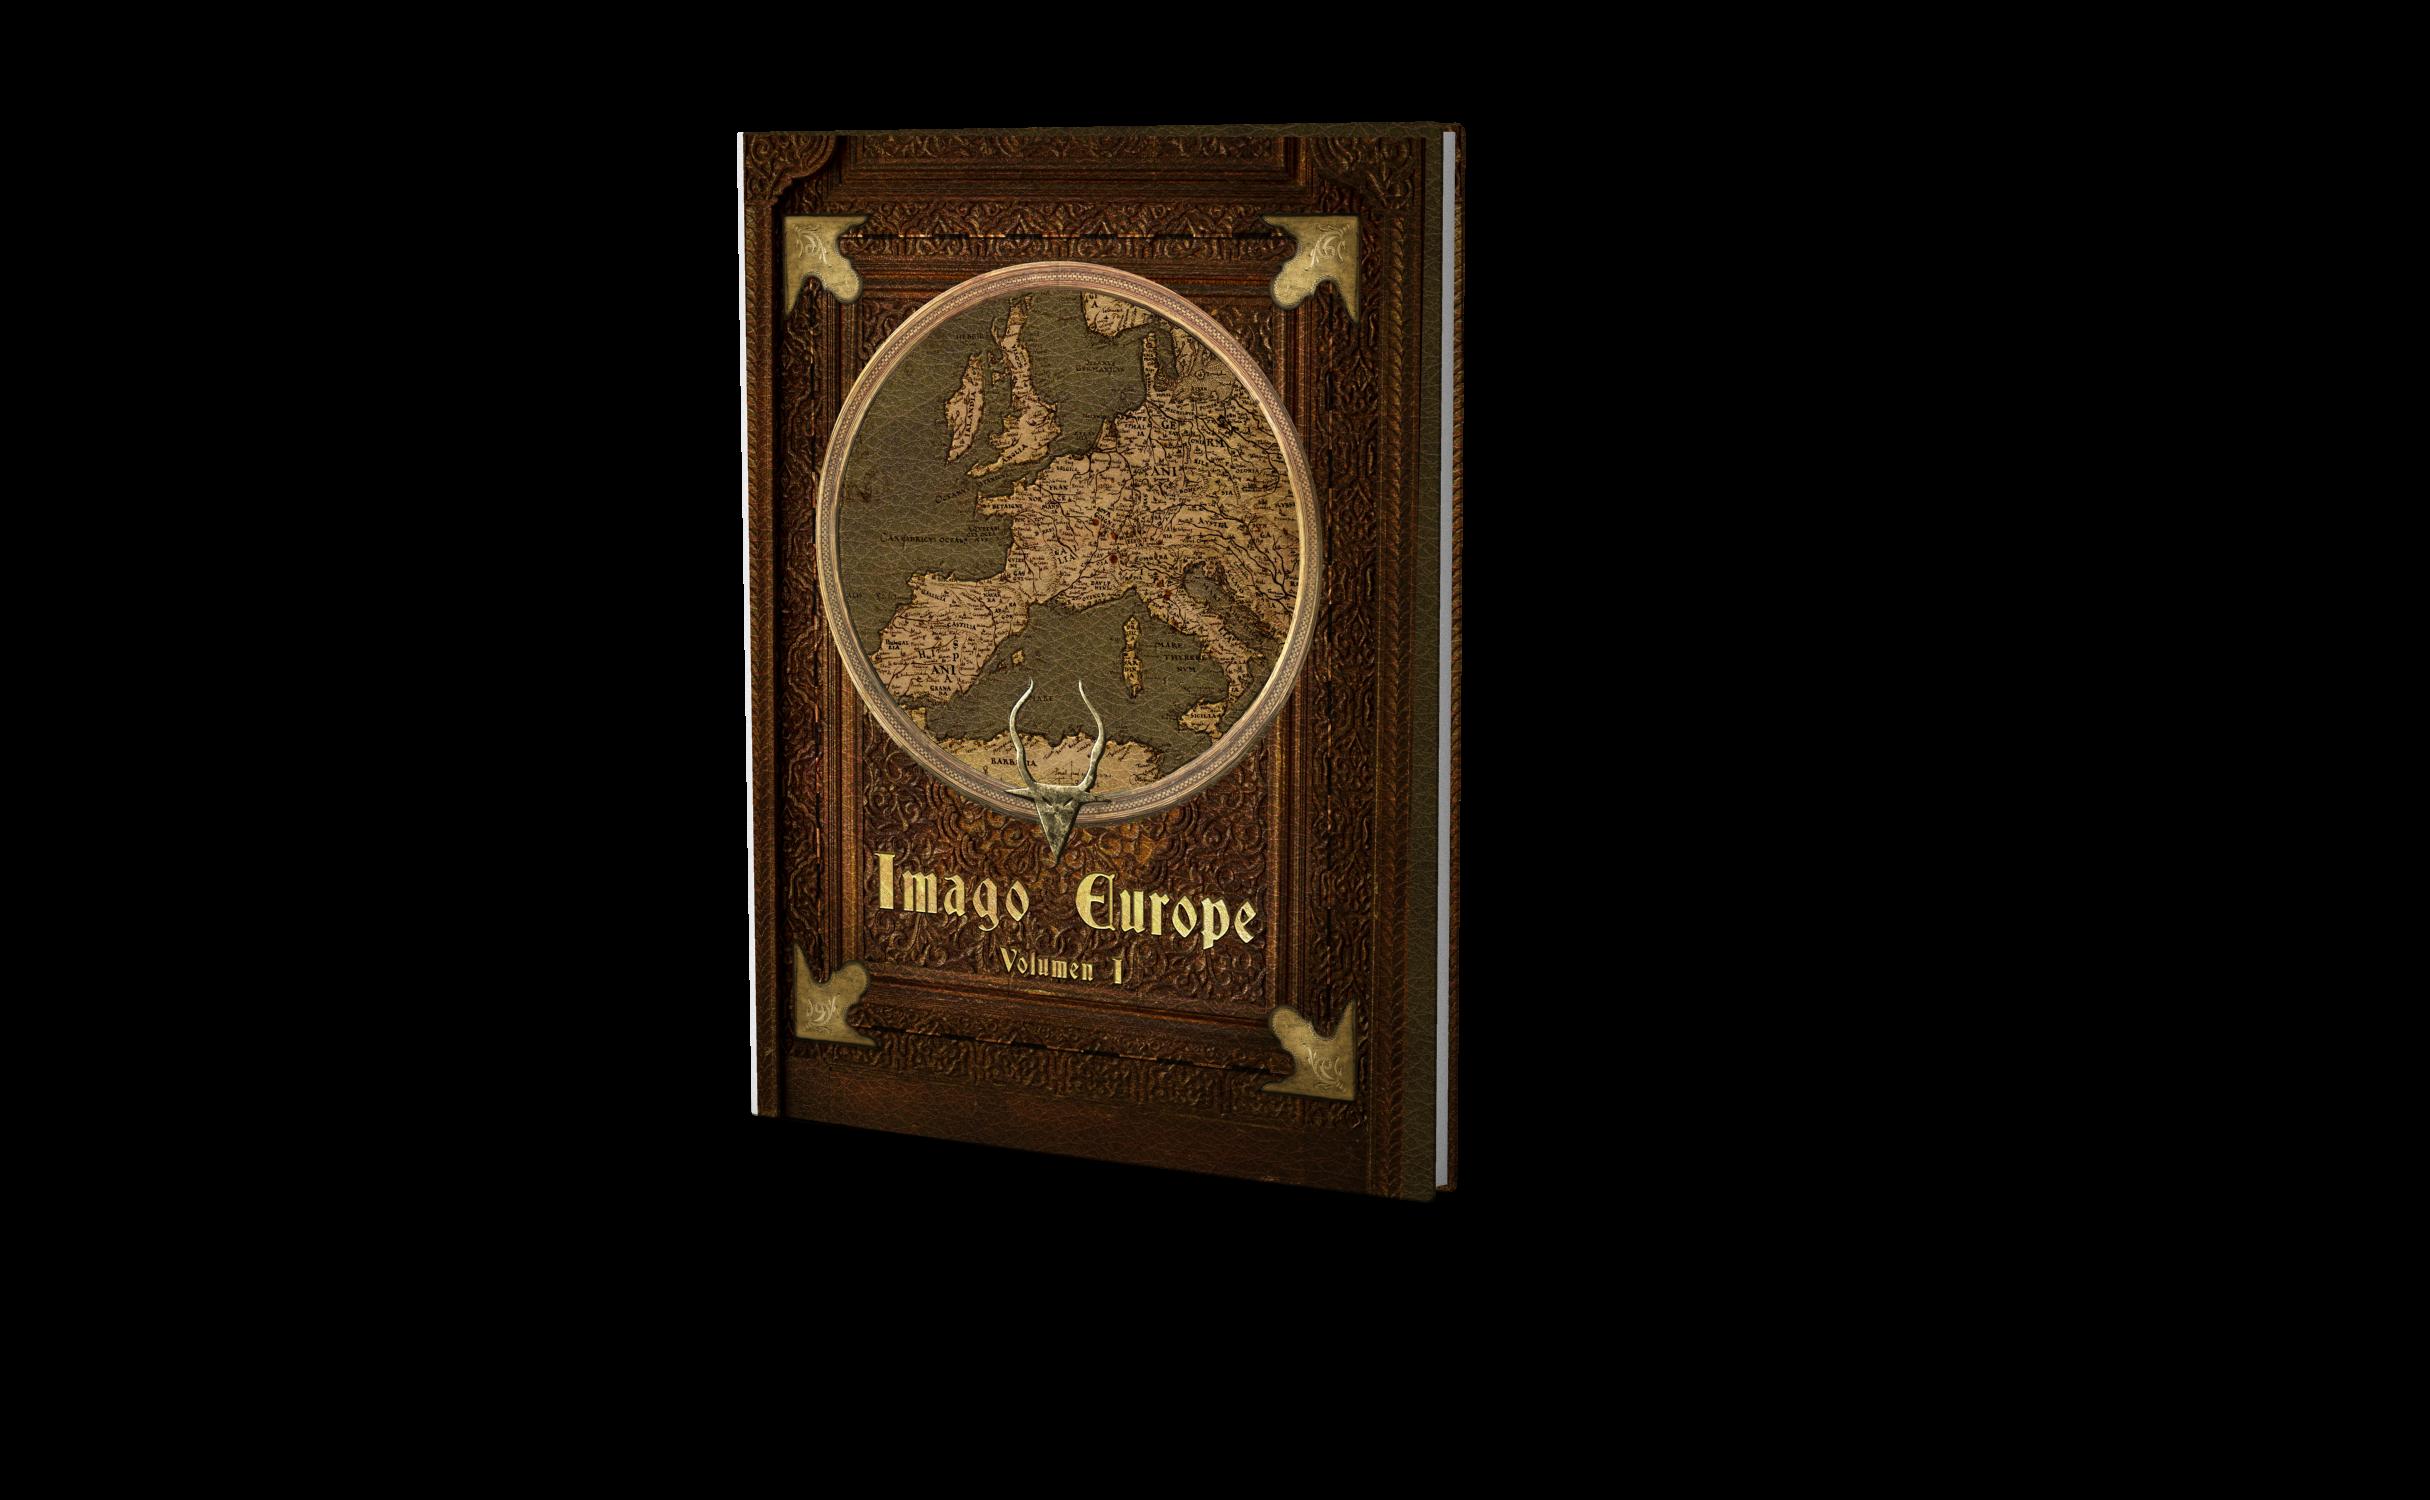 Imago Europe vol. 1, Aquelarre